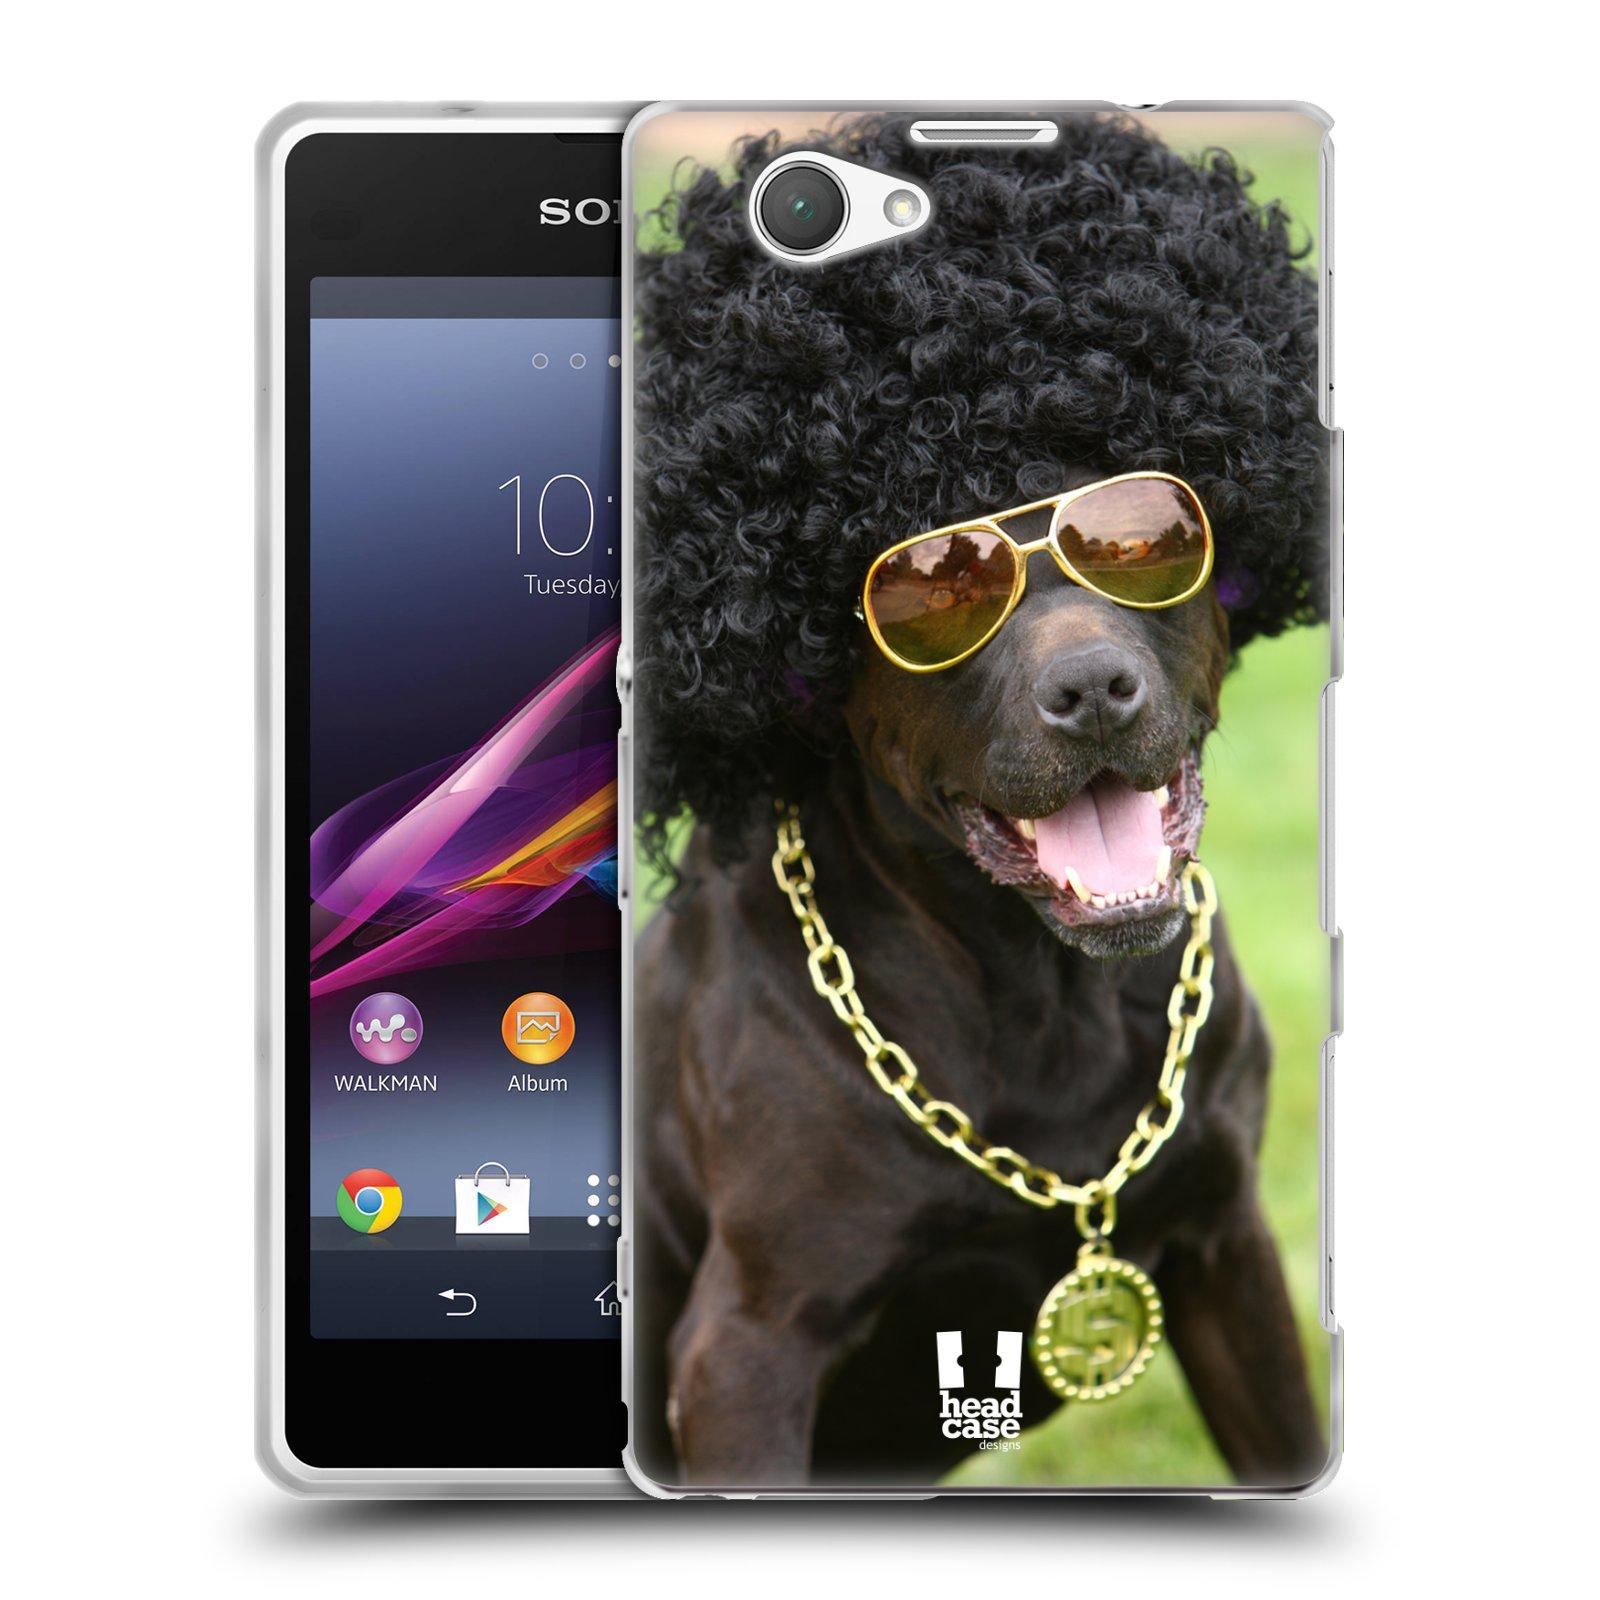 HEAD CASE silikonový obal na mobil Sony Xperia Z1 COMPACT (D5503) vzor Legrační zvířátka pejsek boháč